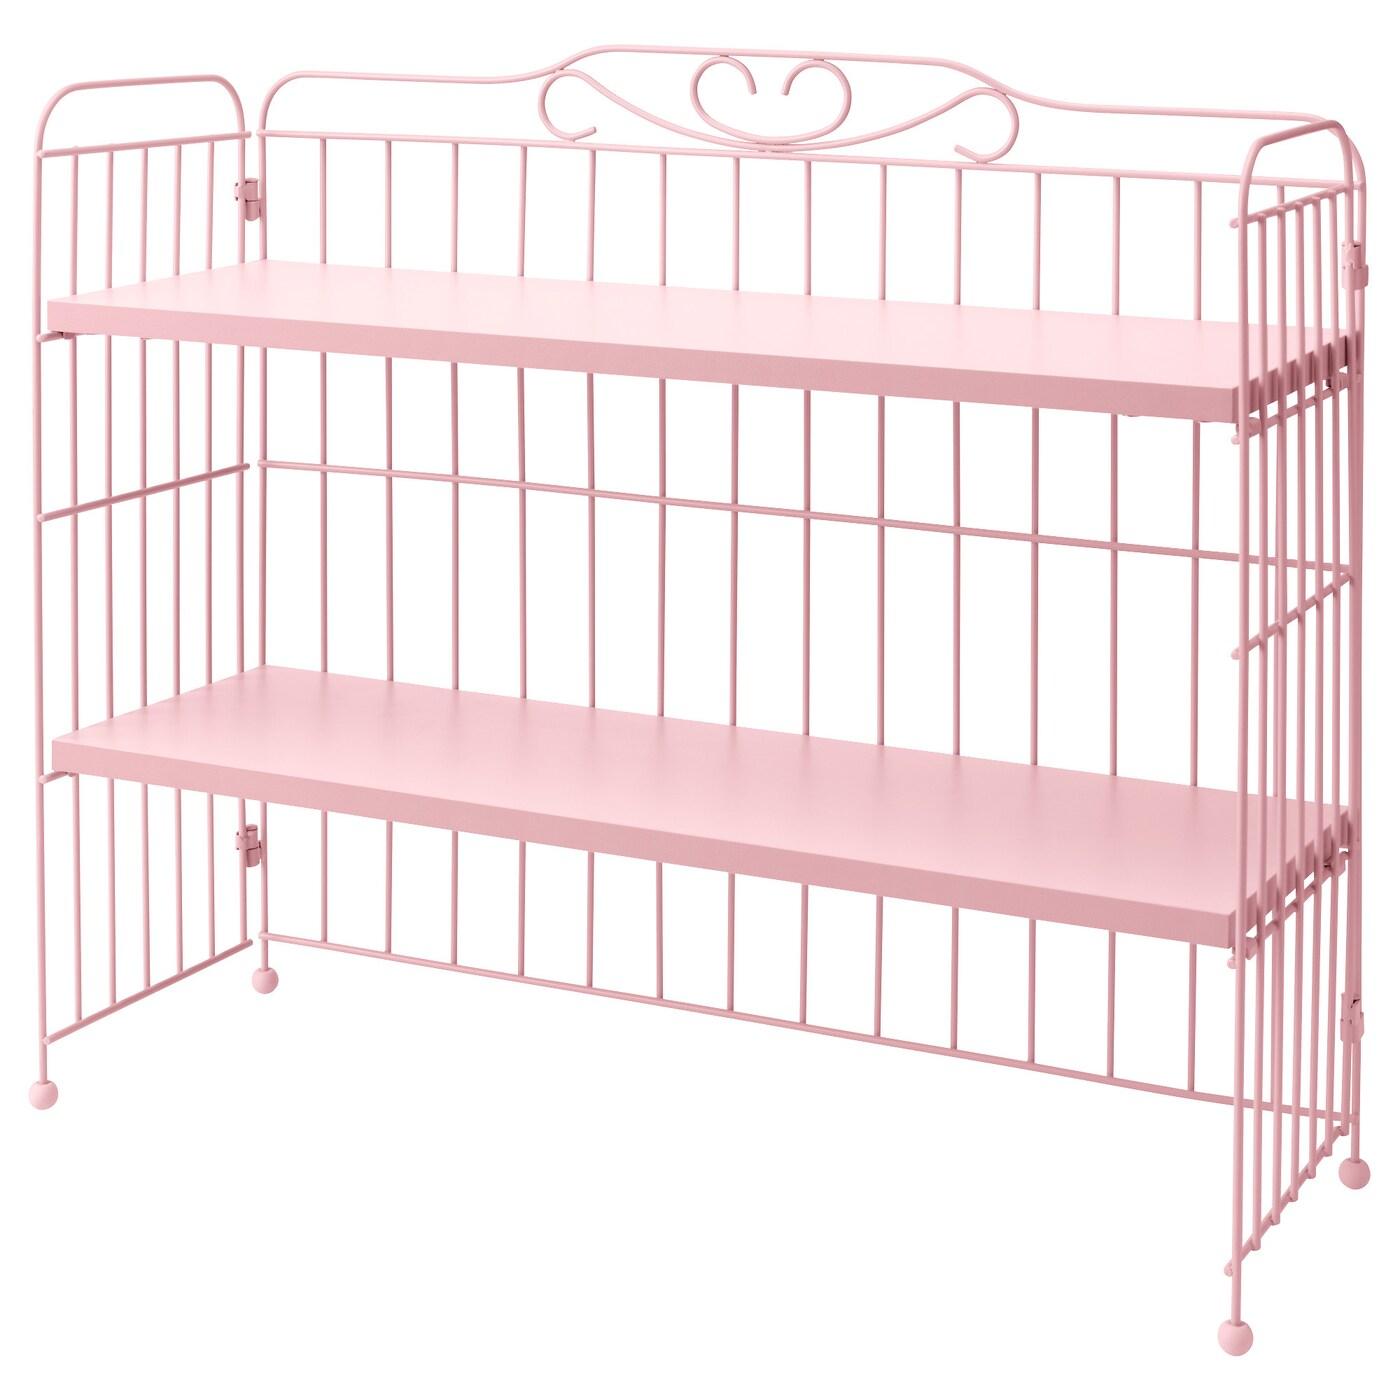 Ikea Kinderzimmer Doppelbett ~ FALKHÖJDEN, Schreibtischaufsatz, rosa